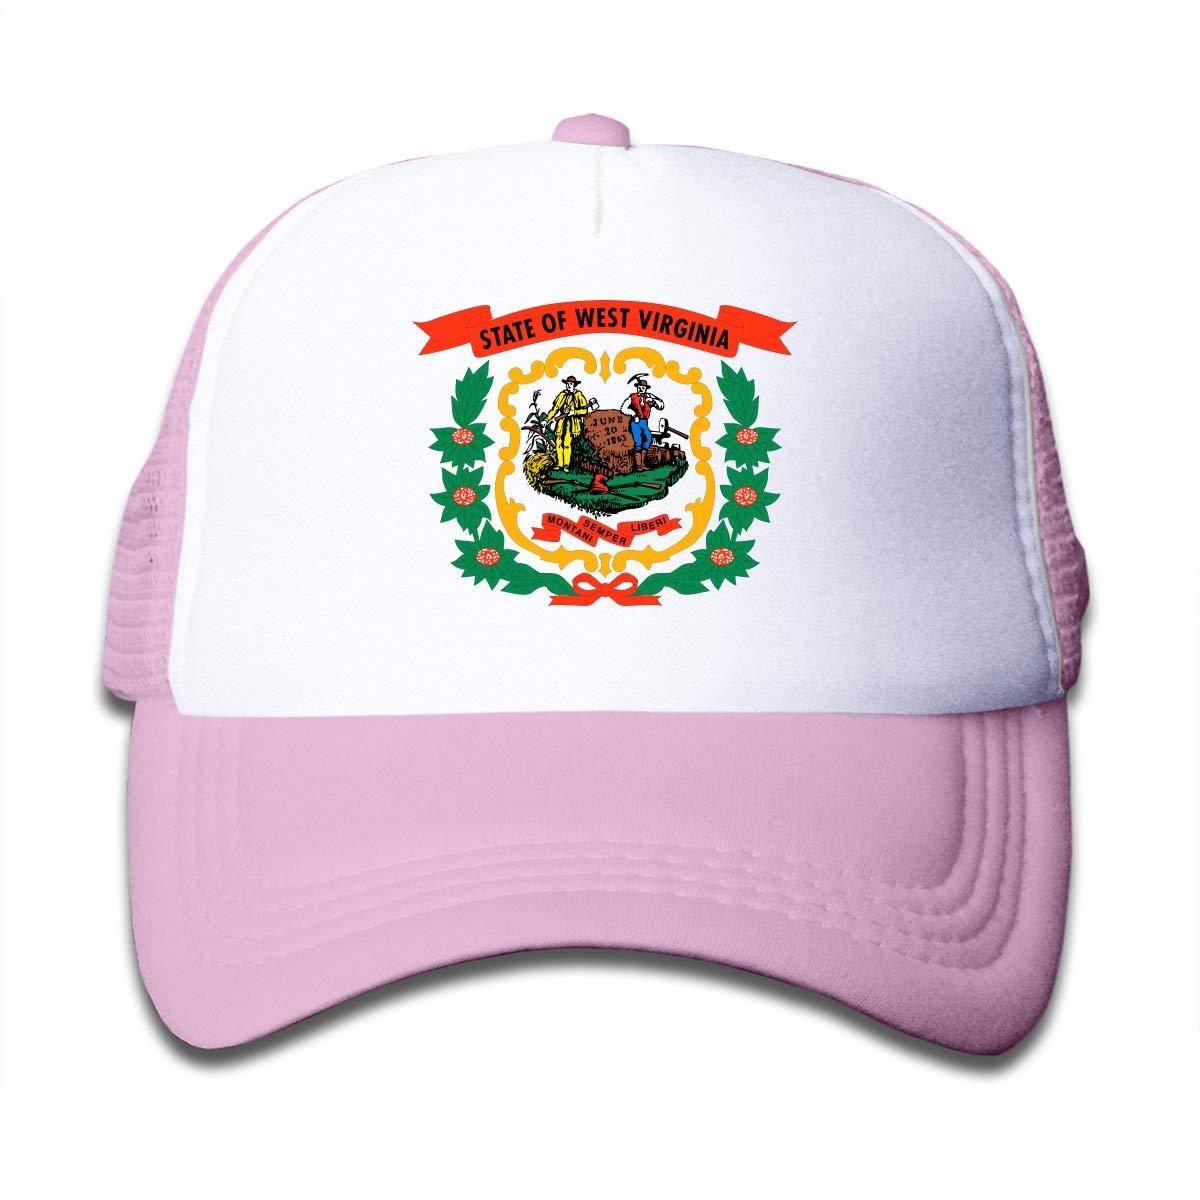 Xinjinhon State of West Virginia Kids Girls Mesh Trucker Hats Adjustable Baseball Caps